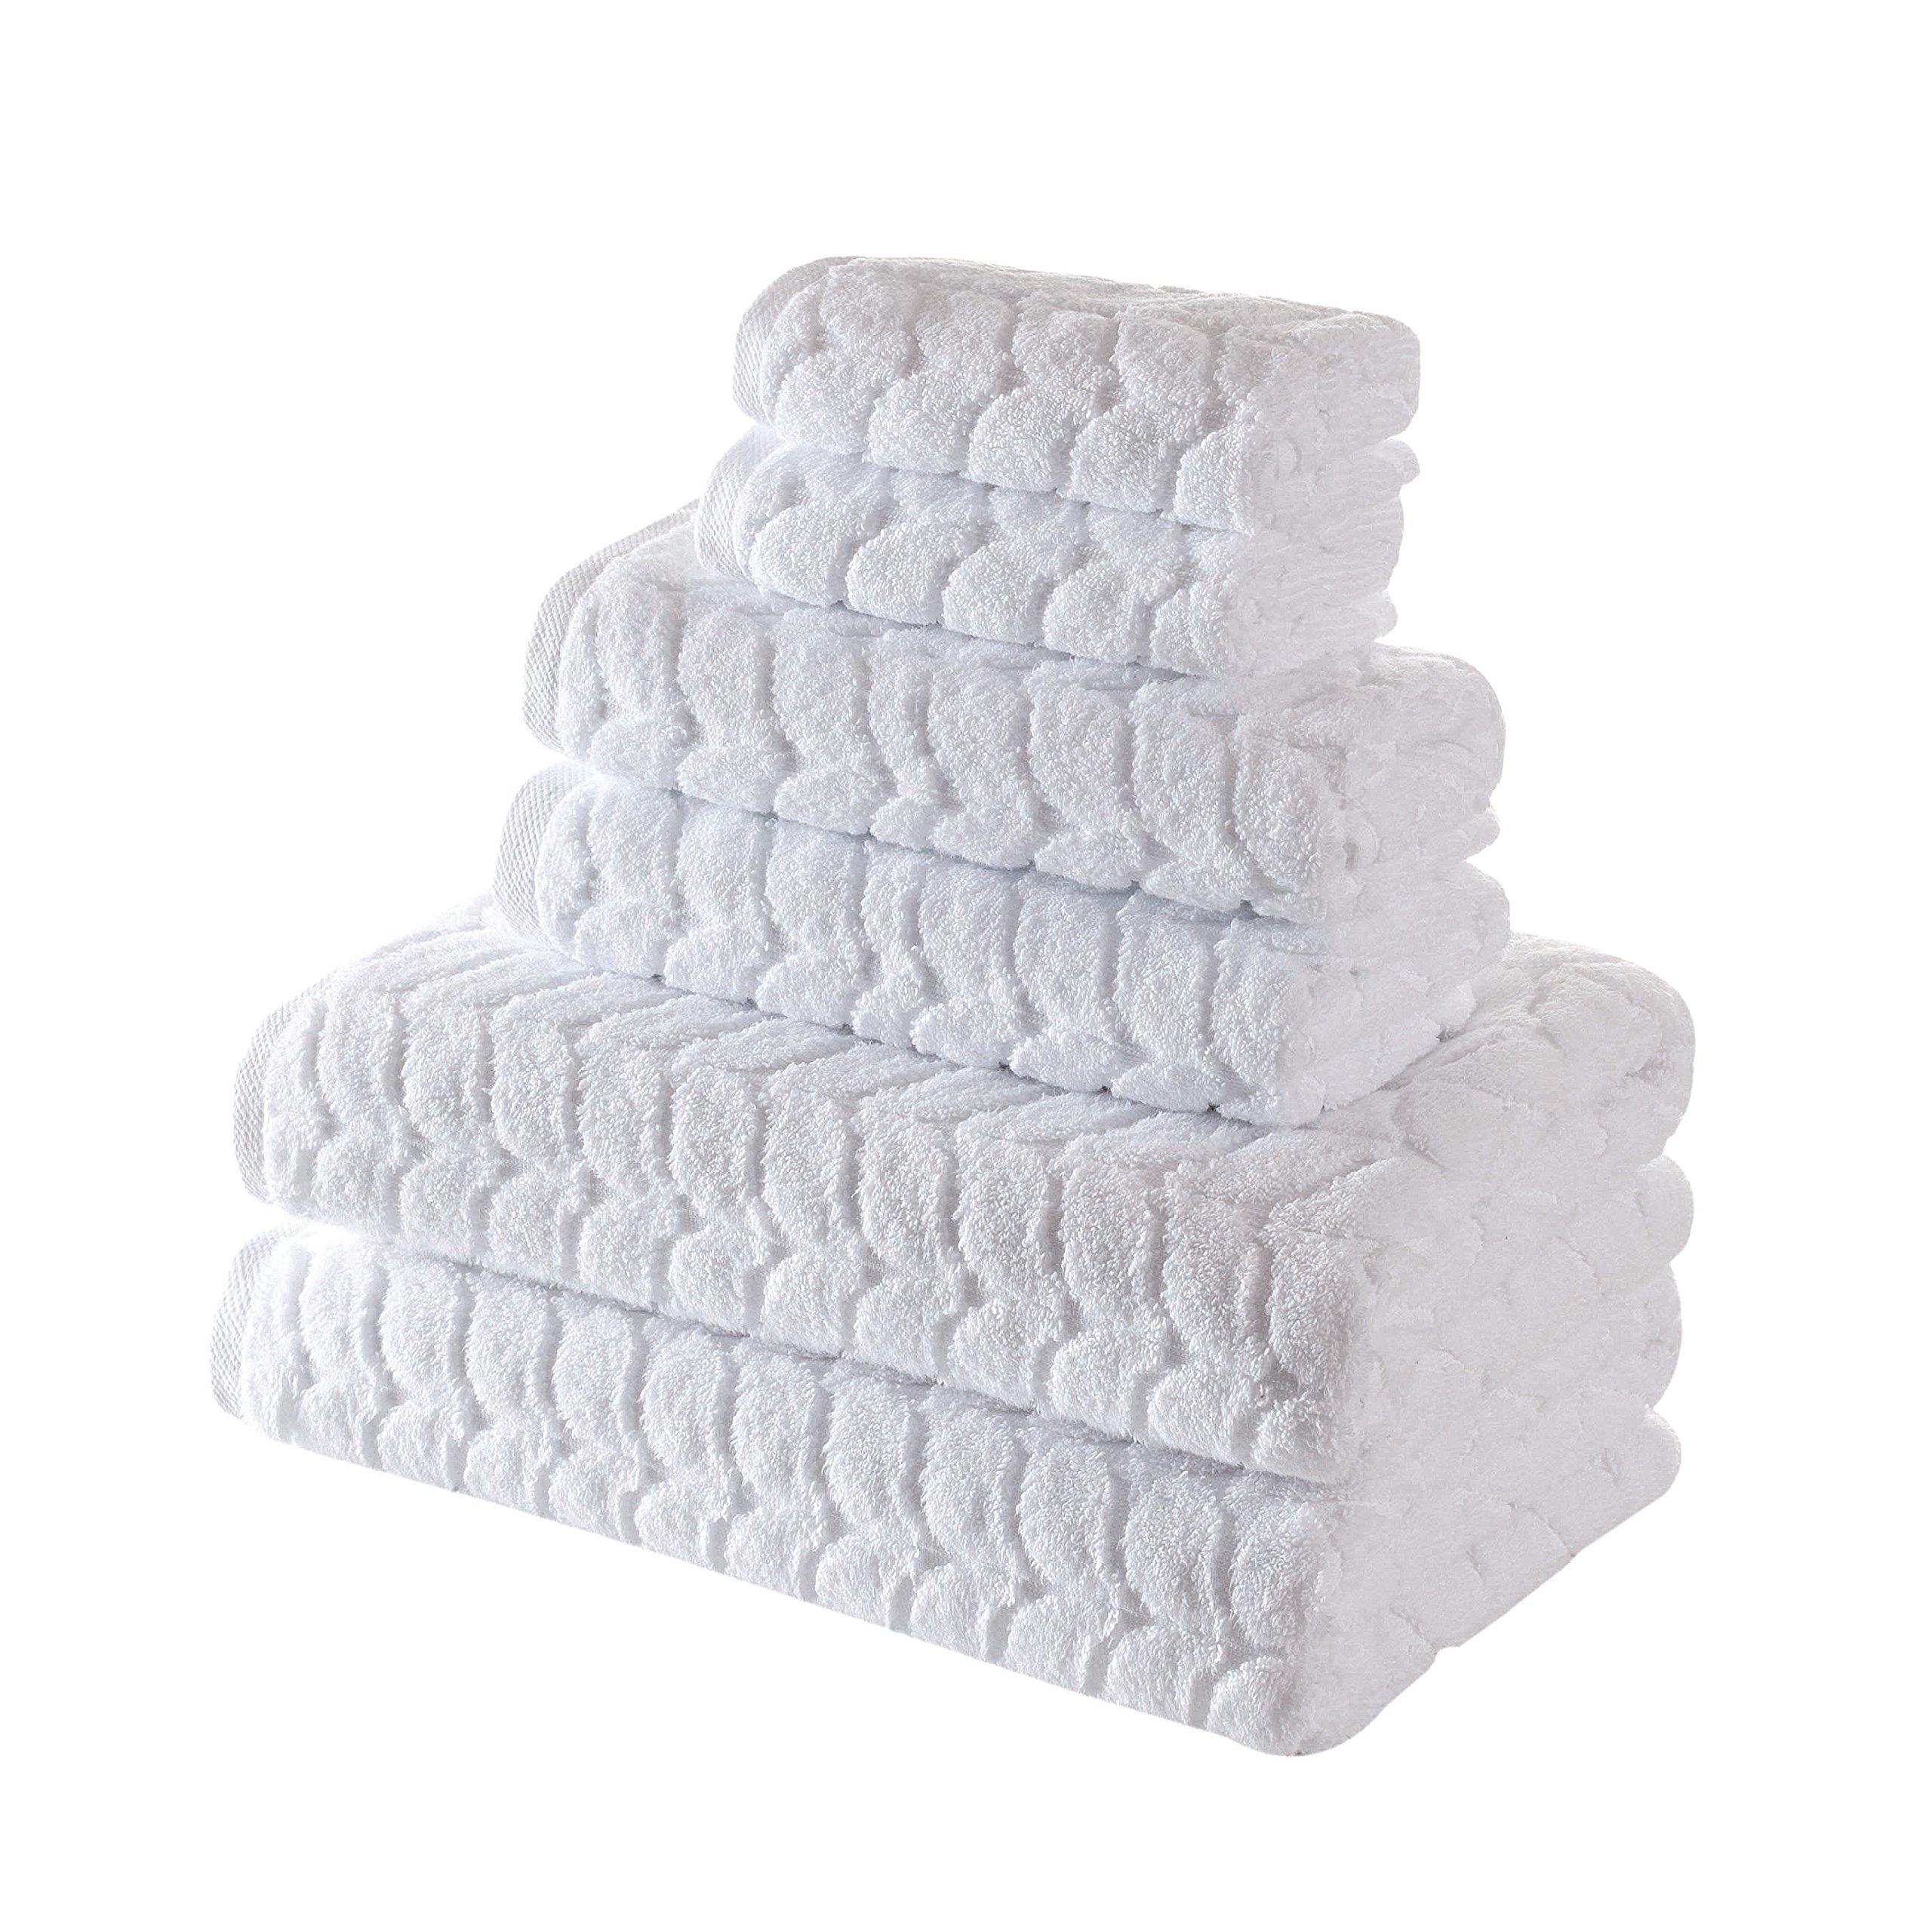 Bagno Milano 700 GSM Ultra Soft Plush Towel , Aqua Fibro Extra-Absorbent Natural, untreated GMO free Turkish Cotton (6 Pieces Towel Set, White)